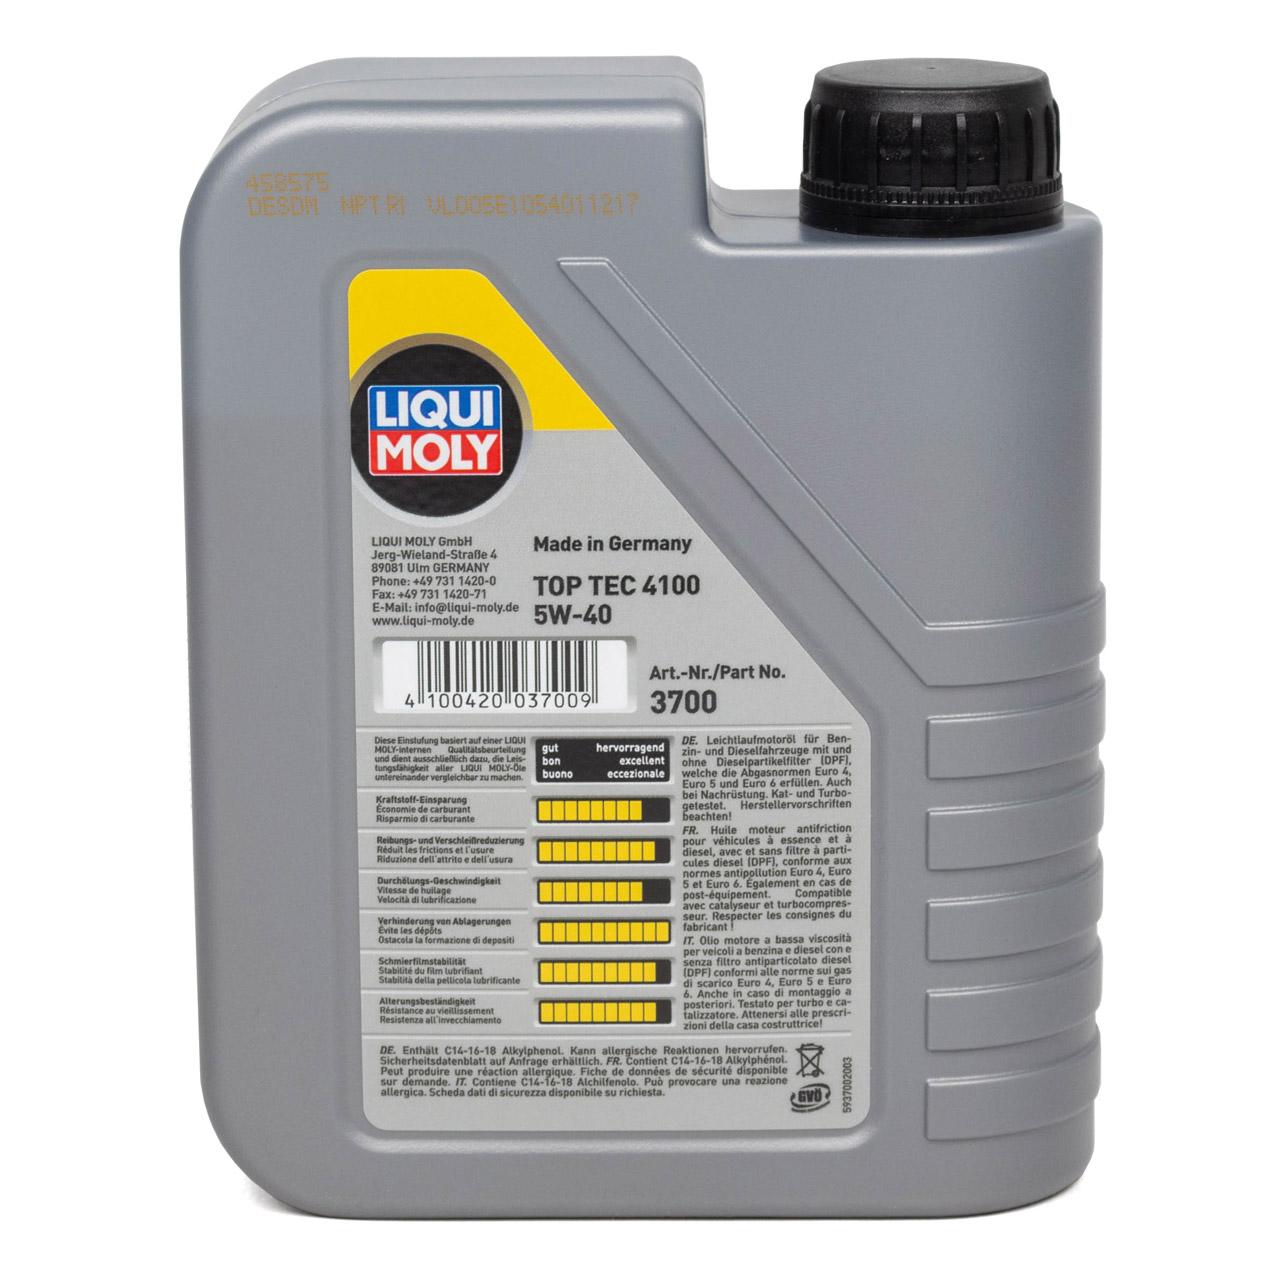 LIQUI MOLY Motoröl Öl TOP TEC 4100 5W40 5W-40 1L 1Liter 3700